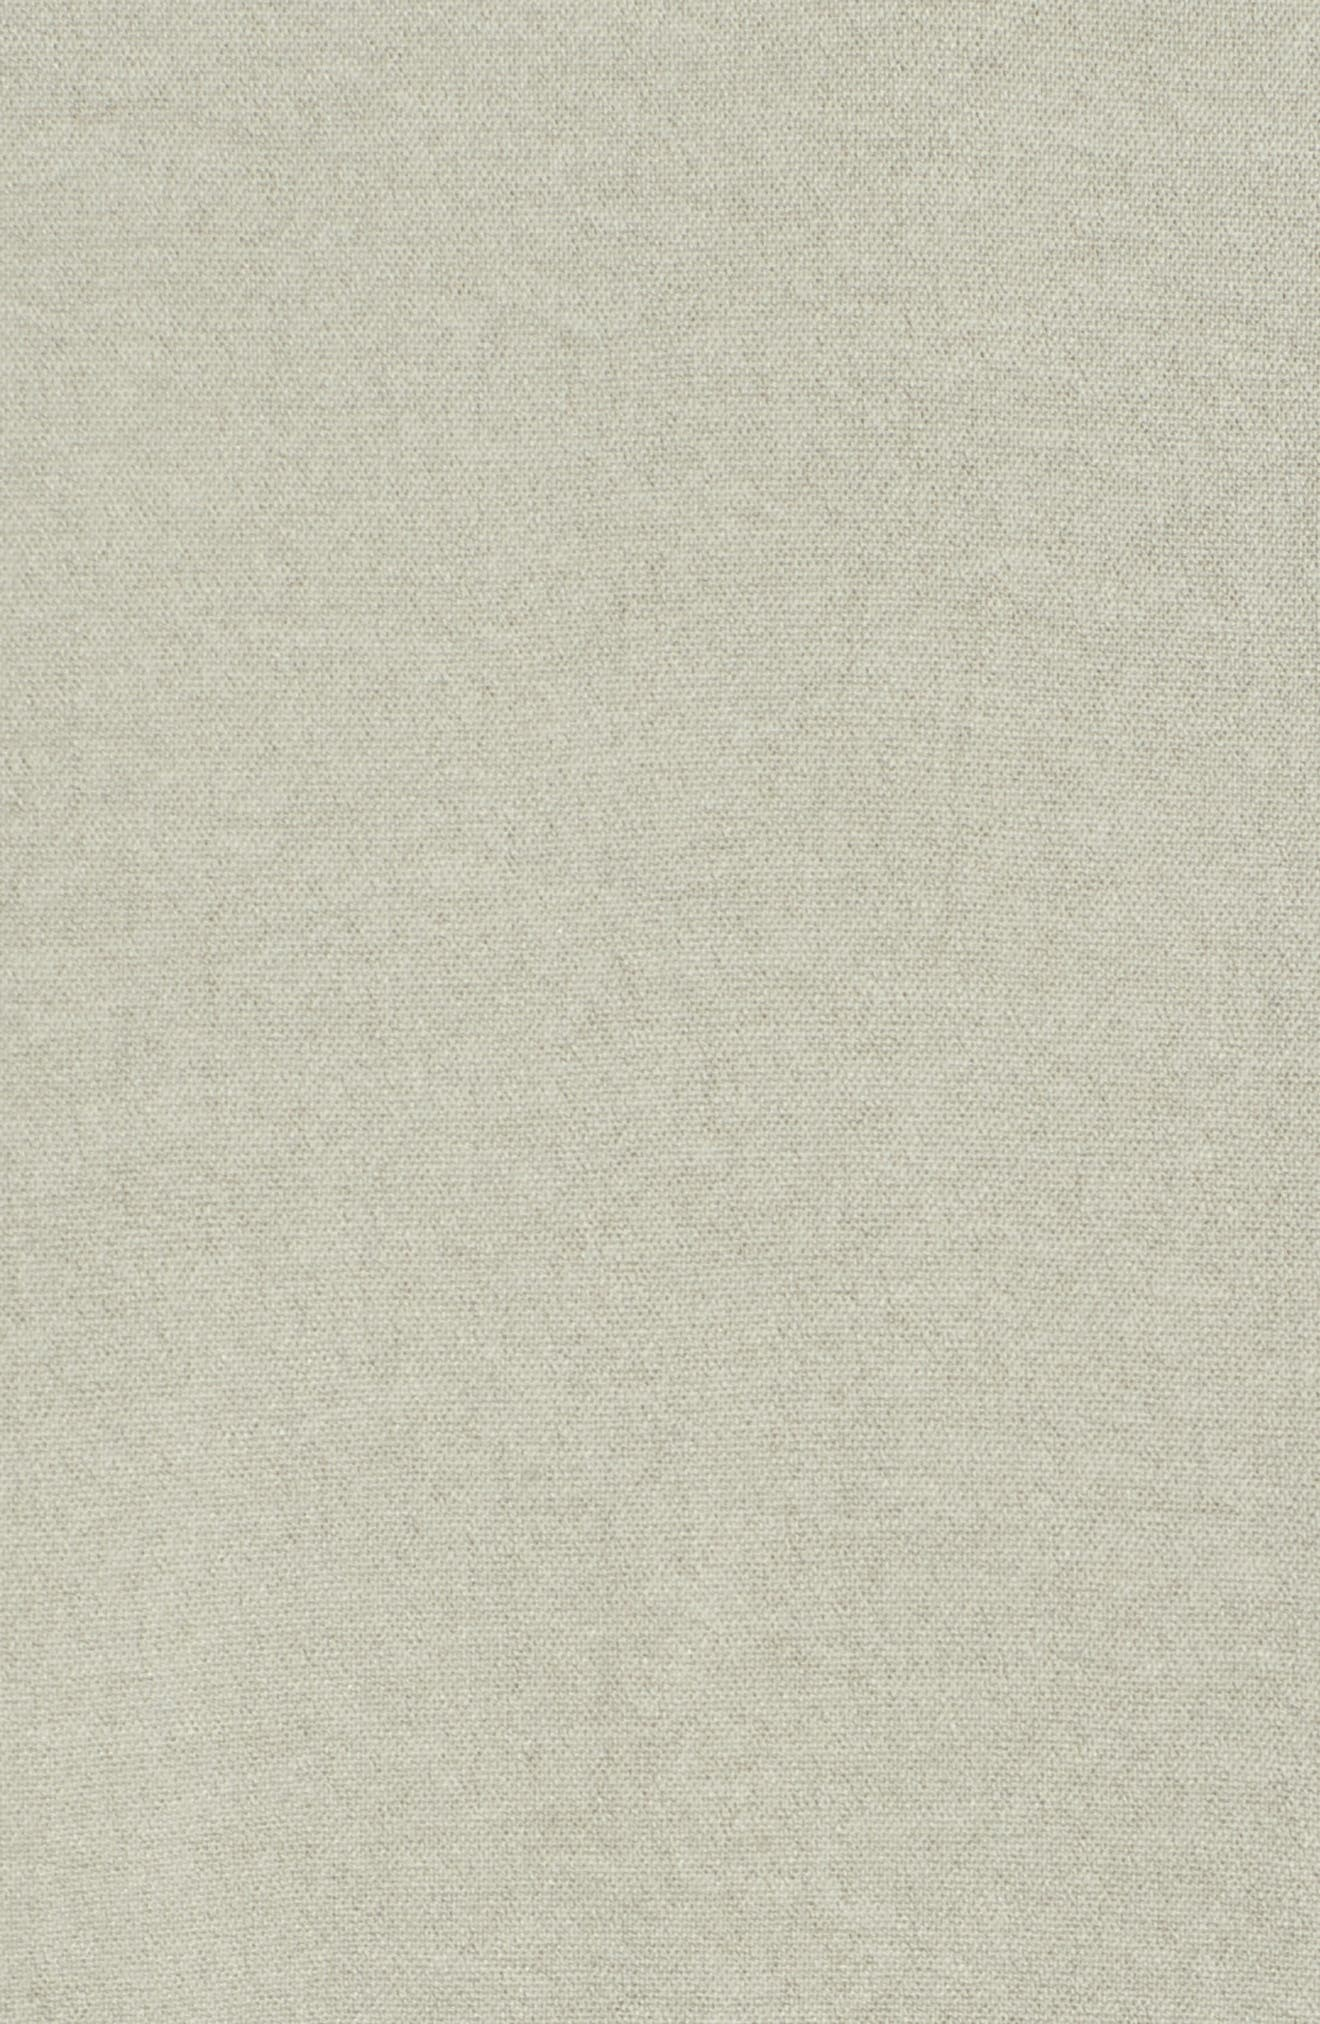 Chriselle x J.O.A. Asymmetrical Trench Dress,                             Alternate thumbnail 6, color,                             300